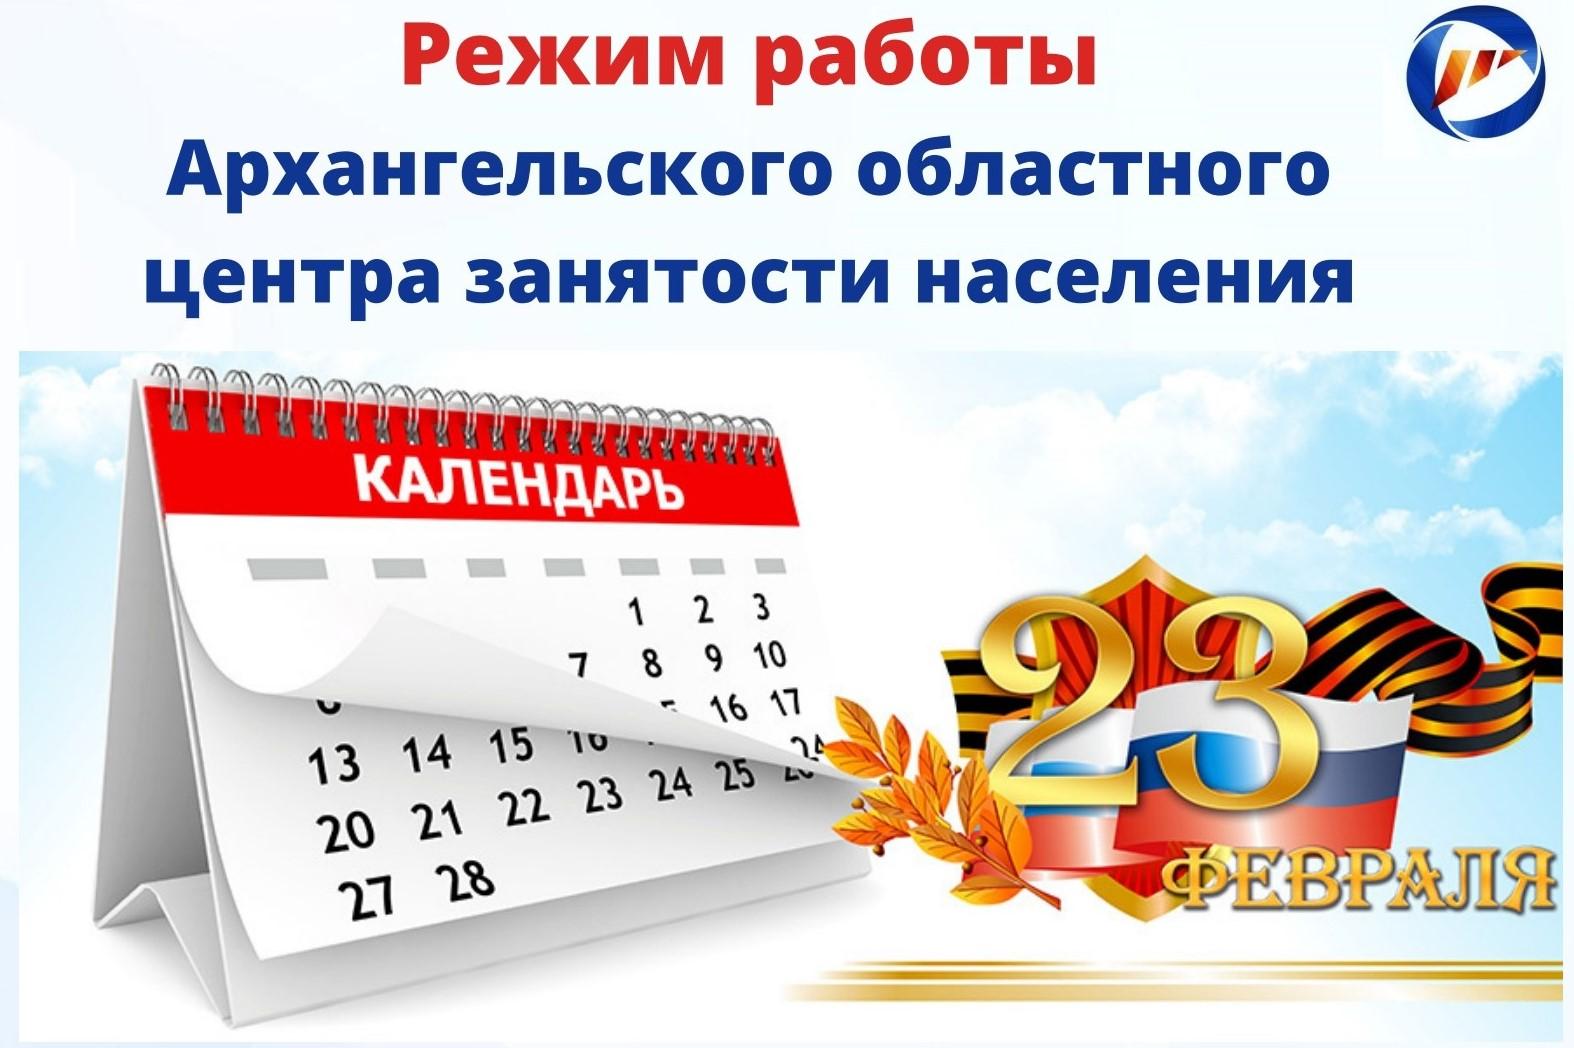 Режим работы службы занятости в связи с празднованием Дня защитника Отечества